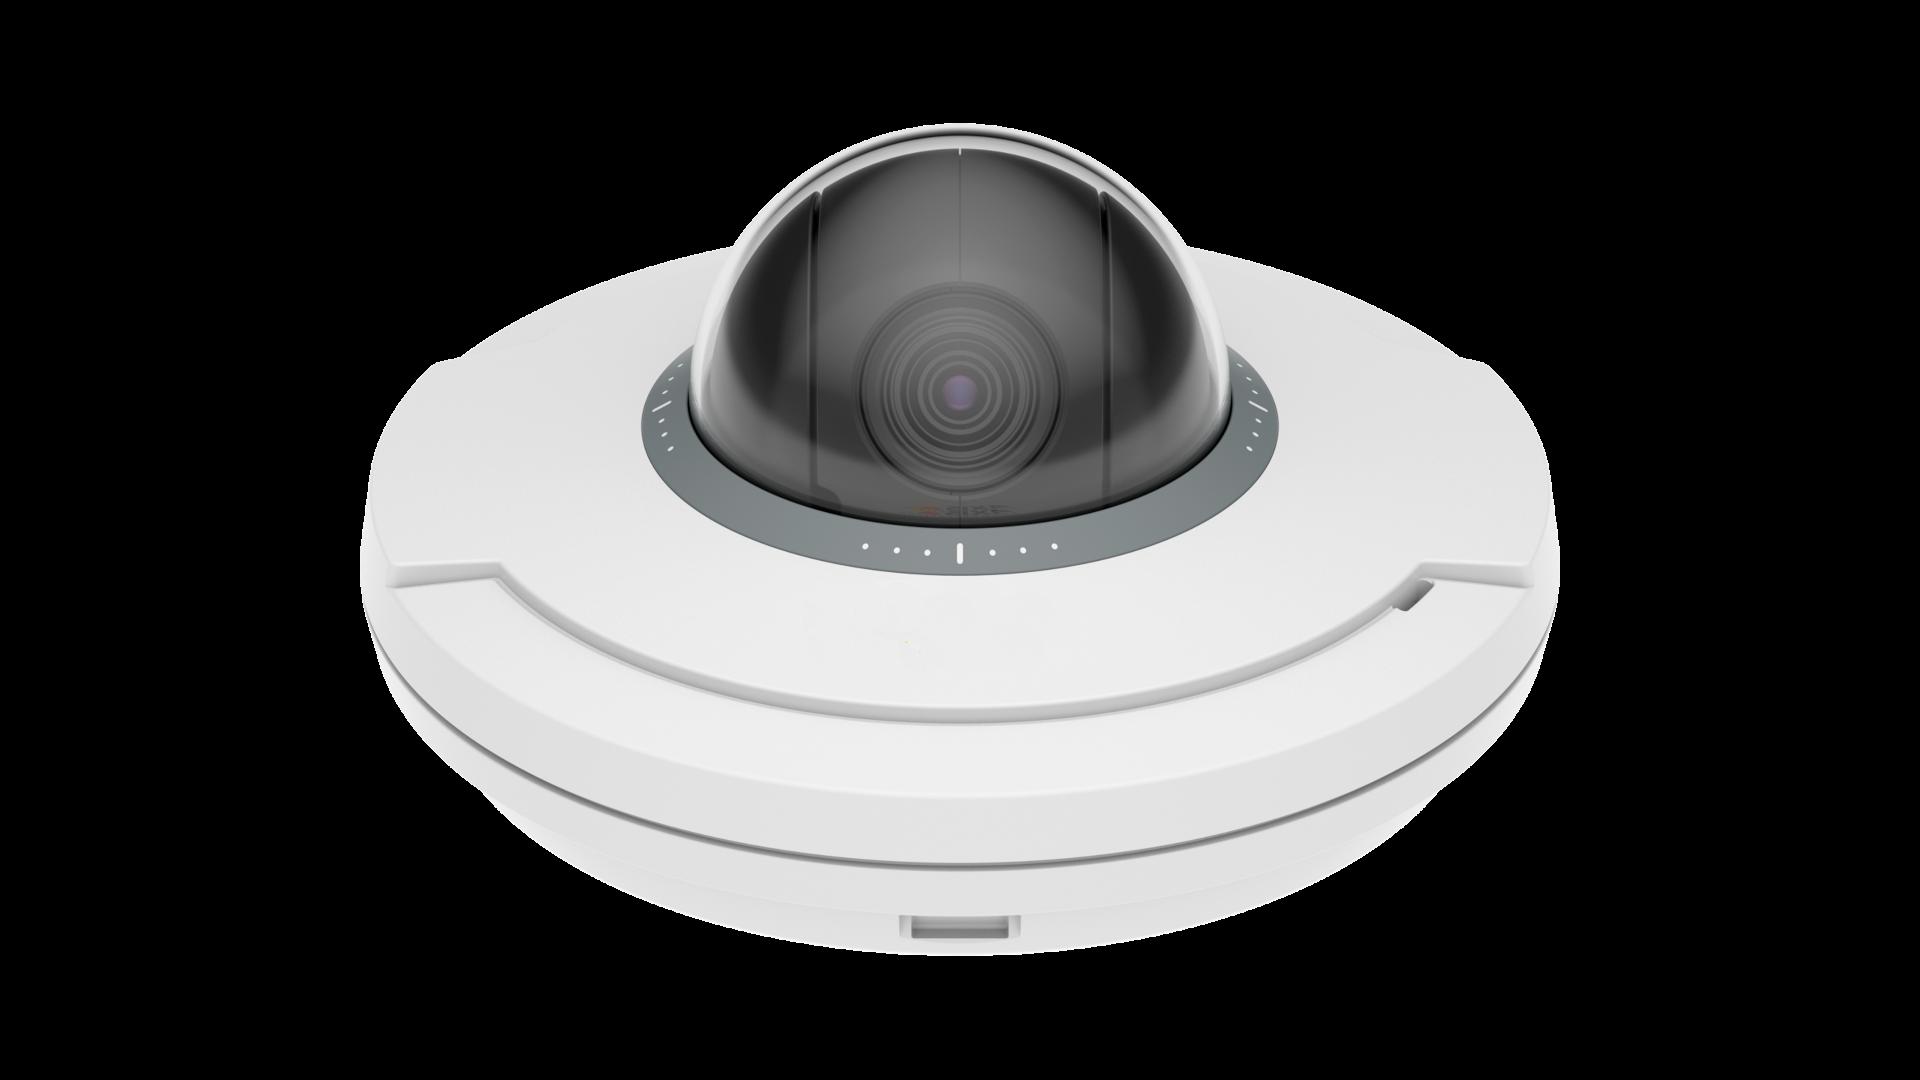 Axis pan-tilt-zoom kamera set forfra